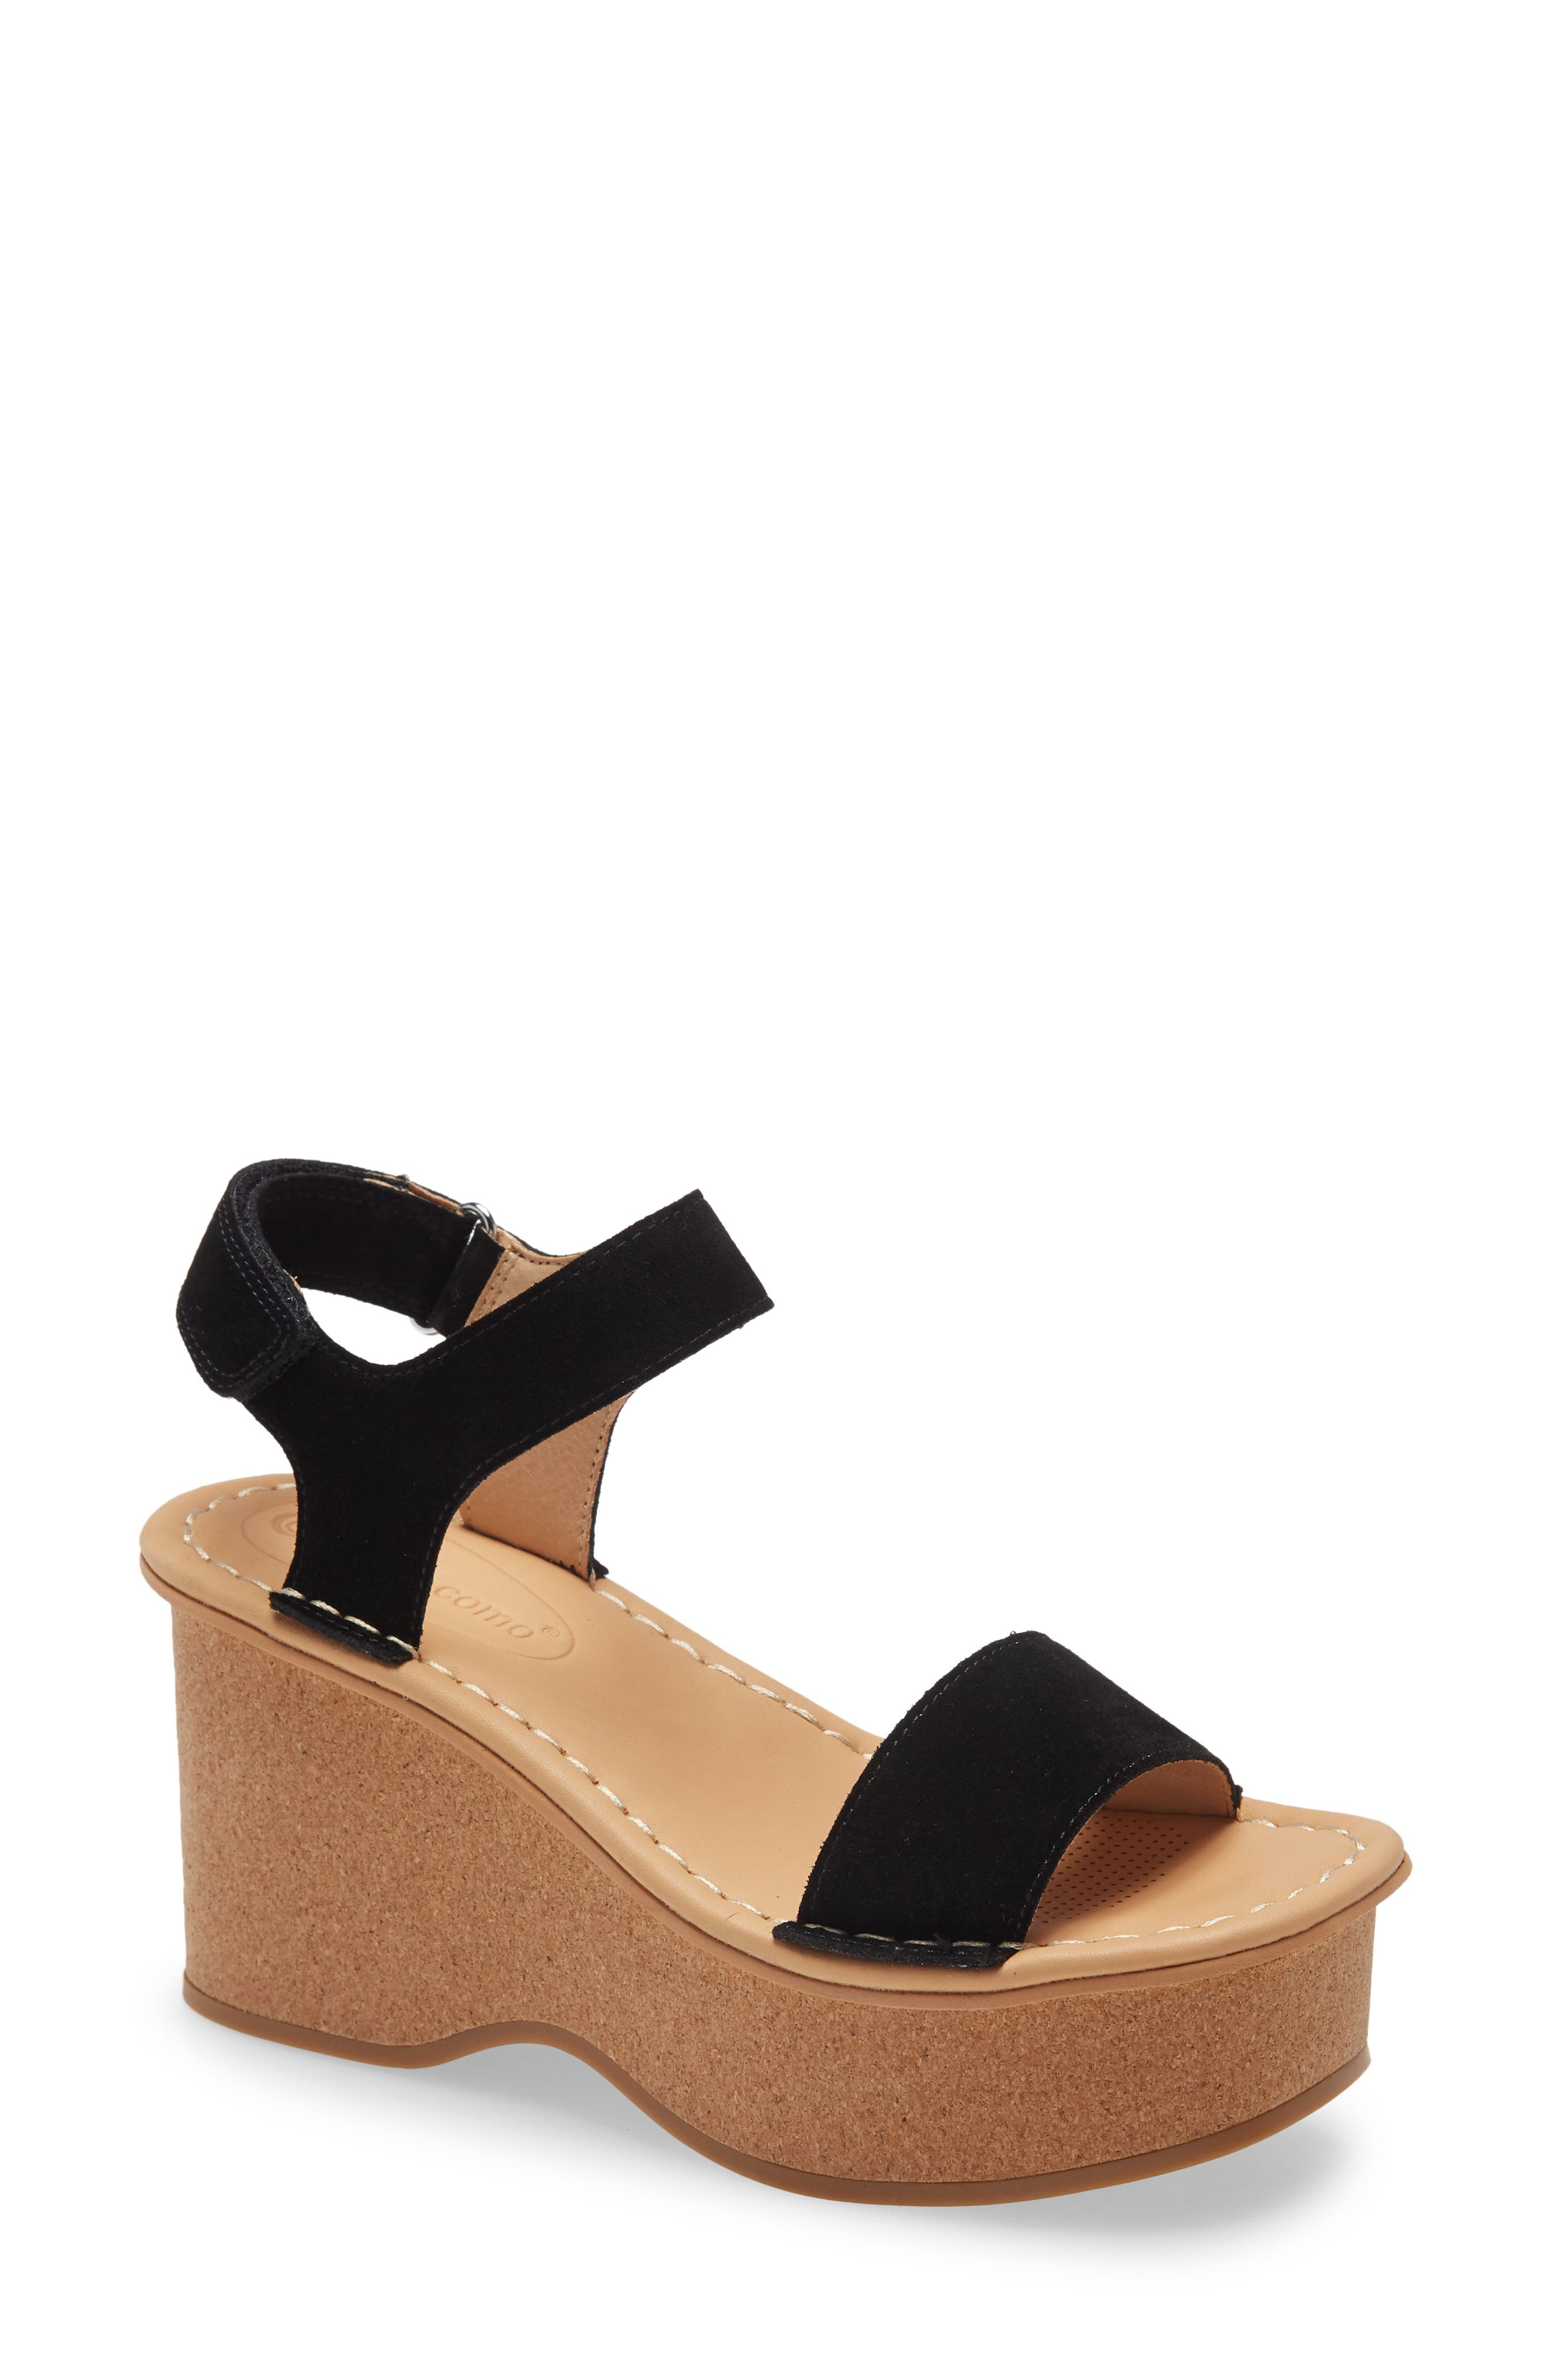 Women's Cc Corso Como Meena Platform Sandal